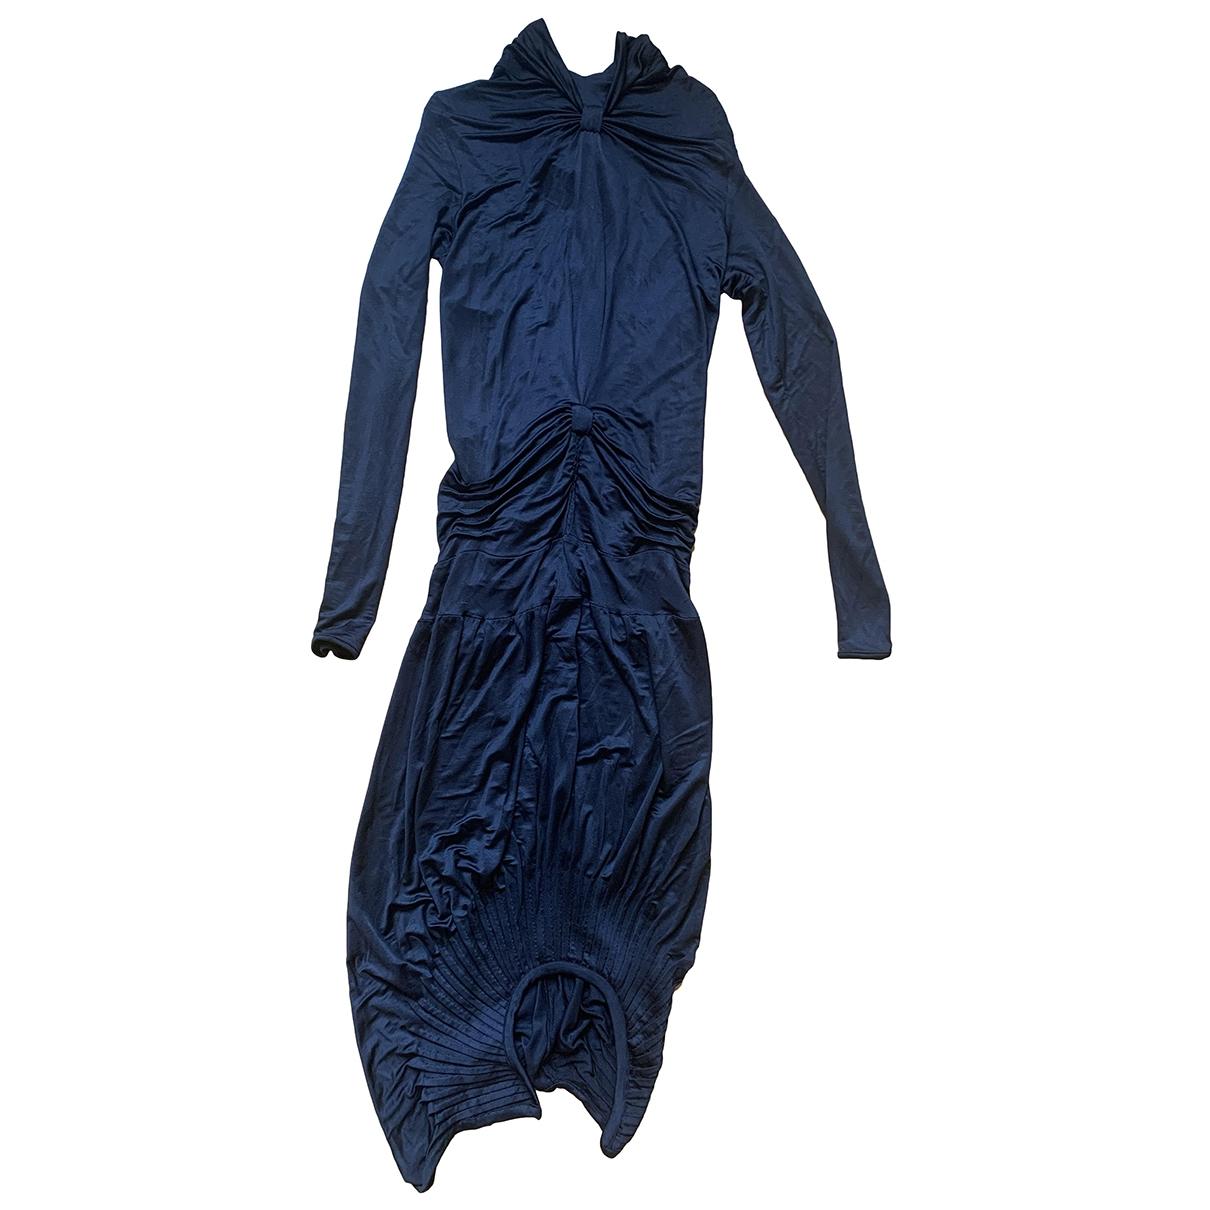 Sophia Kokosalaki \N Kleid in  Schwarz Viskose